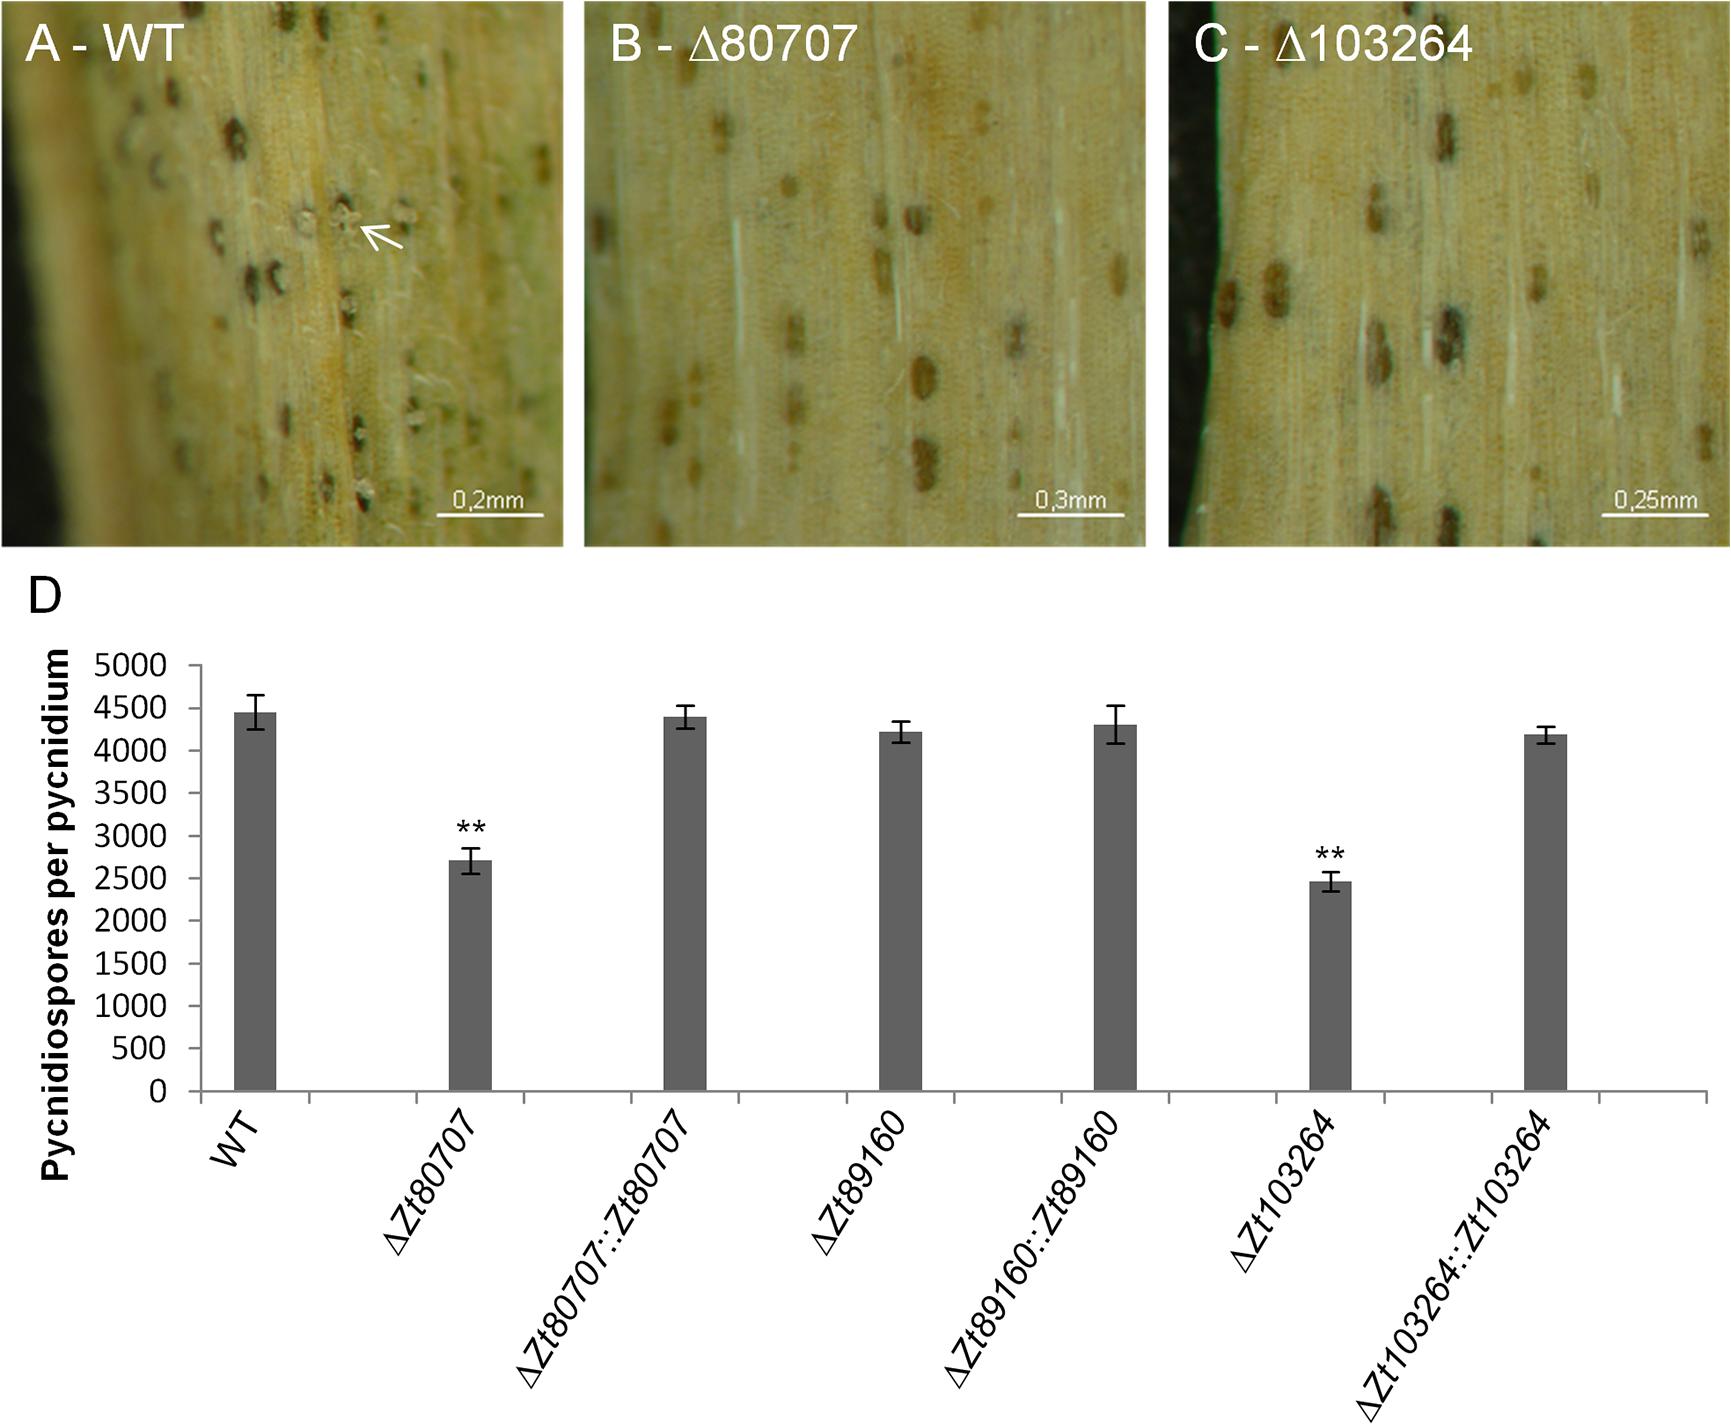 Mutant IPO323Δ<i>Zt80707</i> and IPO323Δ<i>Zt103264</i> produce fewer pycnidiospores per pycnidium.